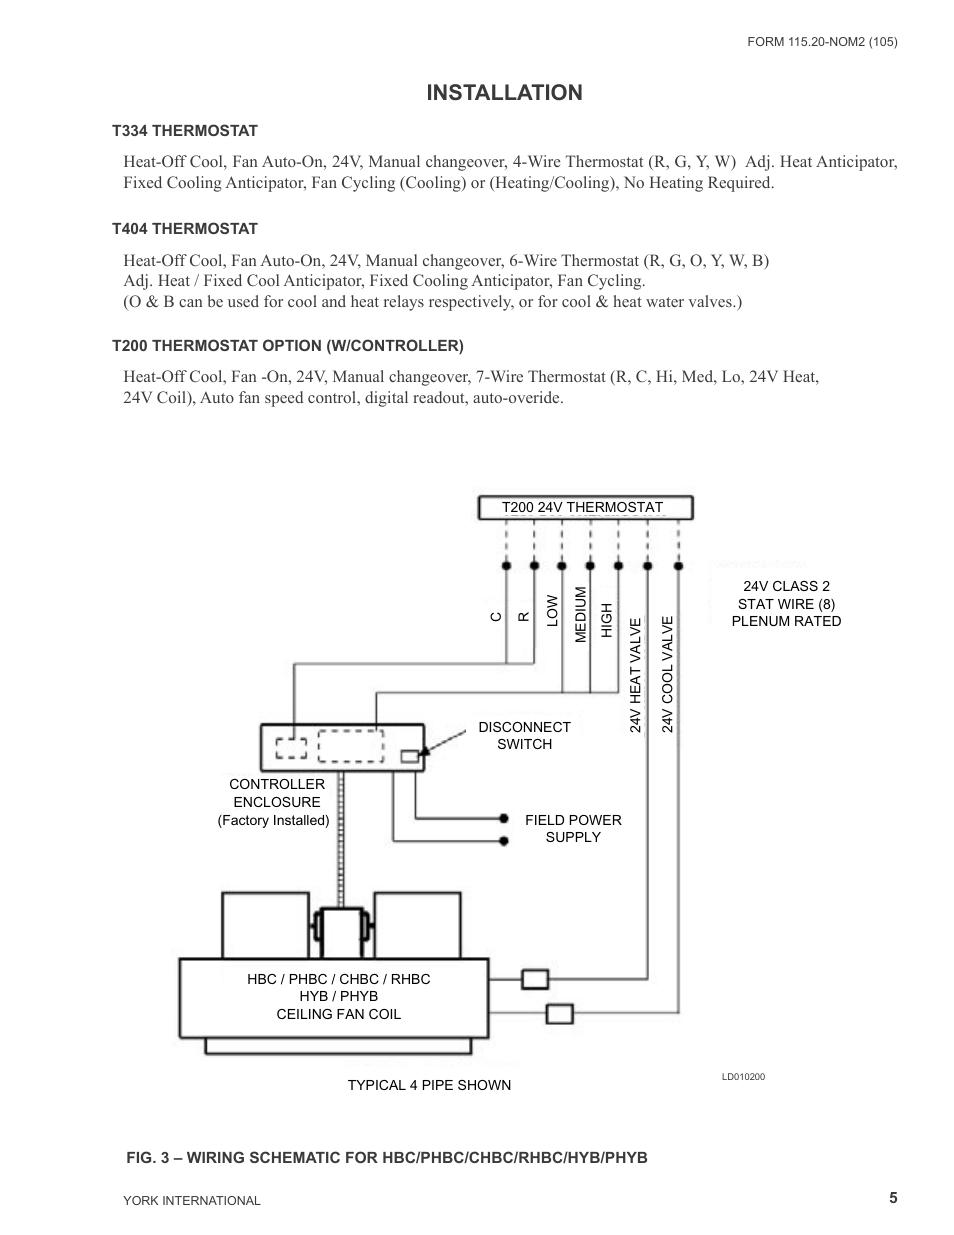 medium resolution of  surge protector wiring diagram installation york yhyb user manual page 5 16 on circuit breaker wiring diagram